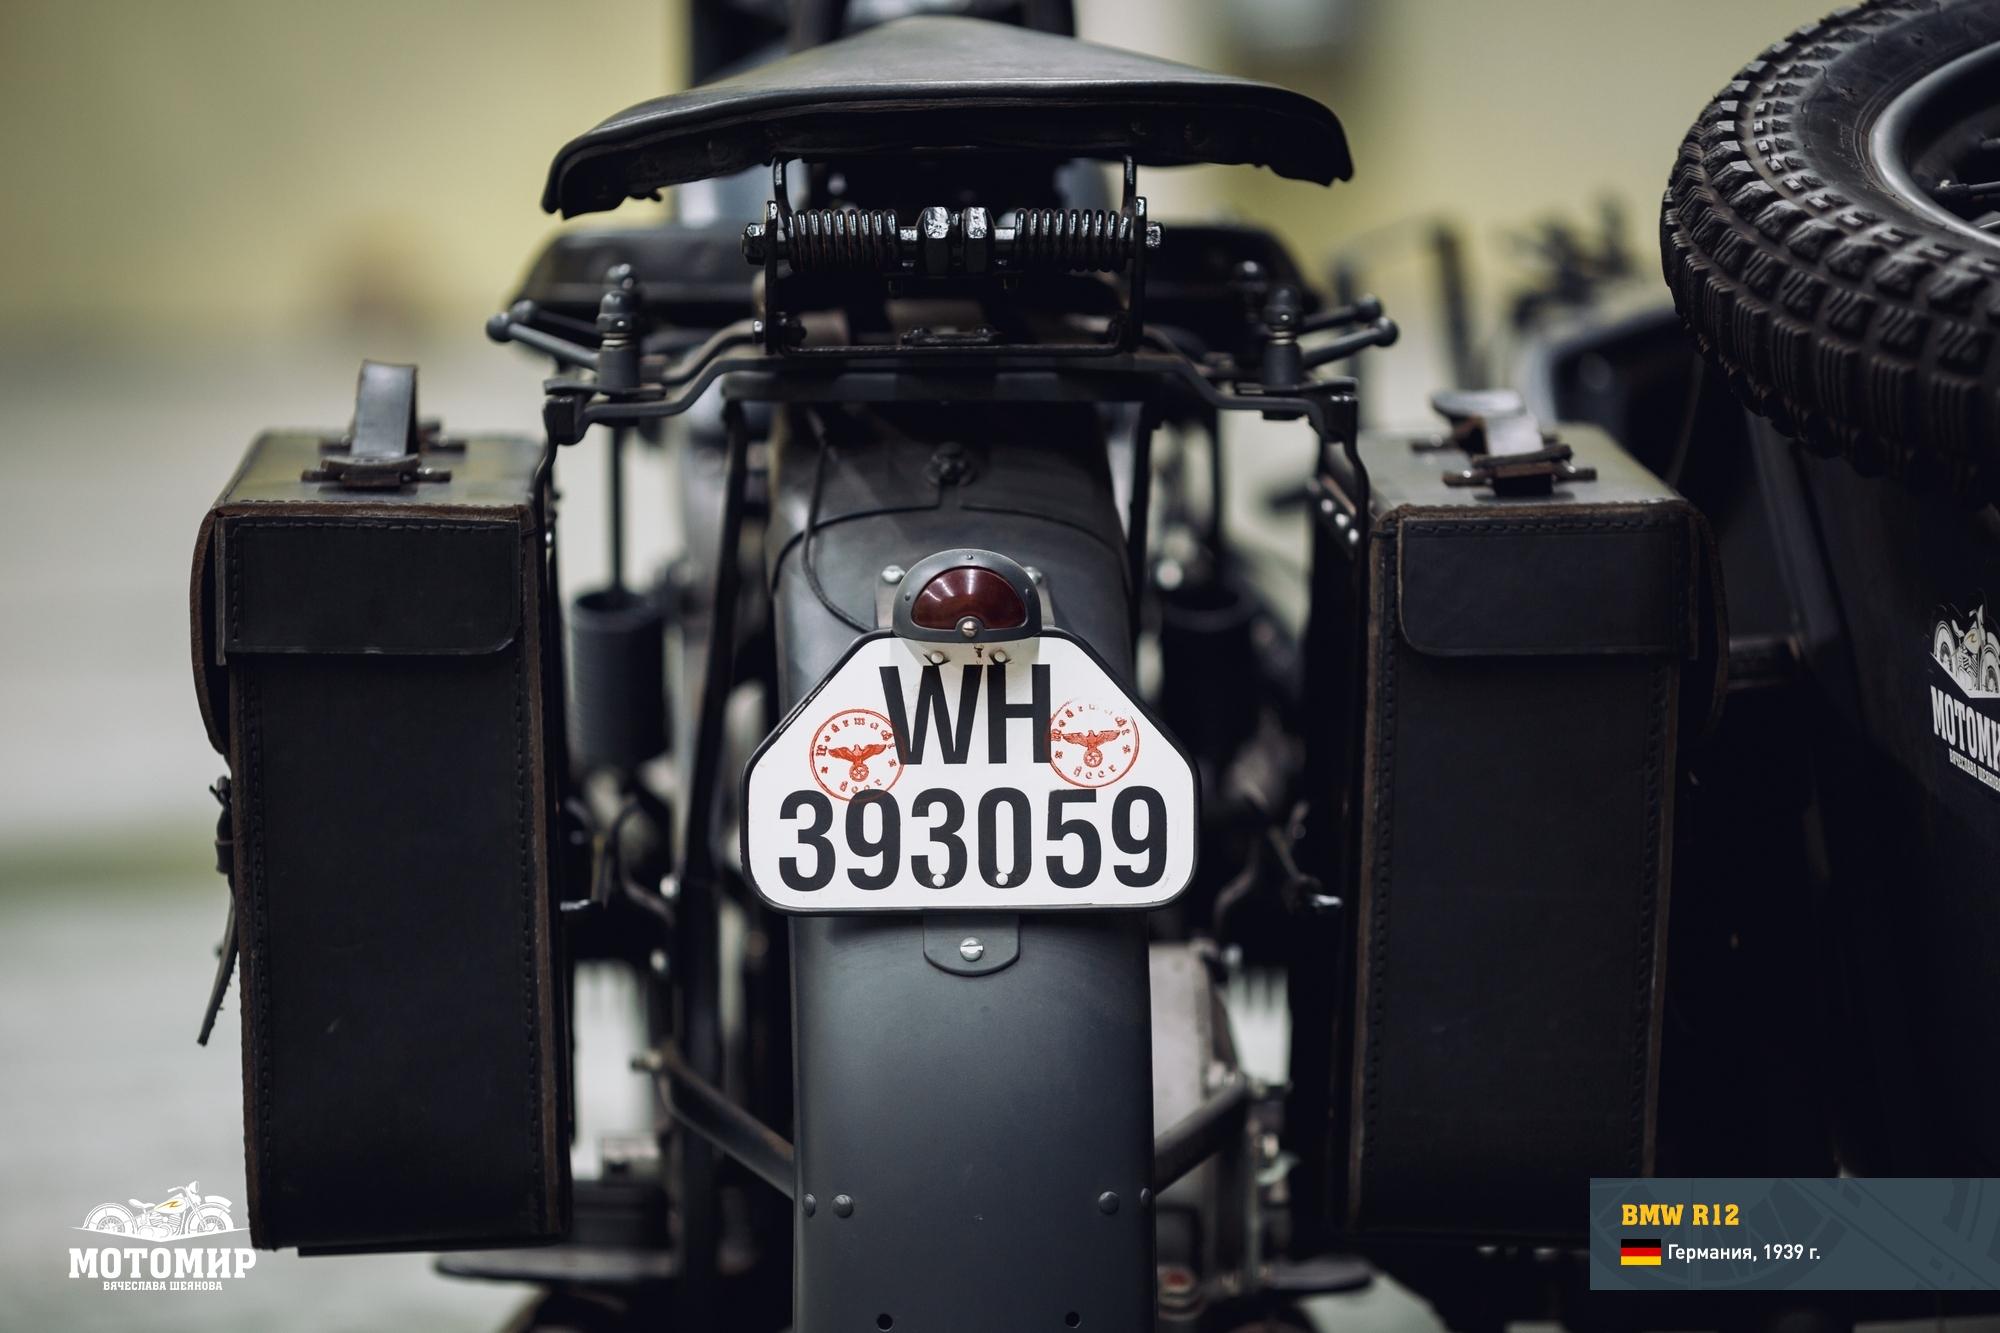 bmw-r12-201503-web-14